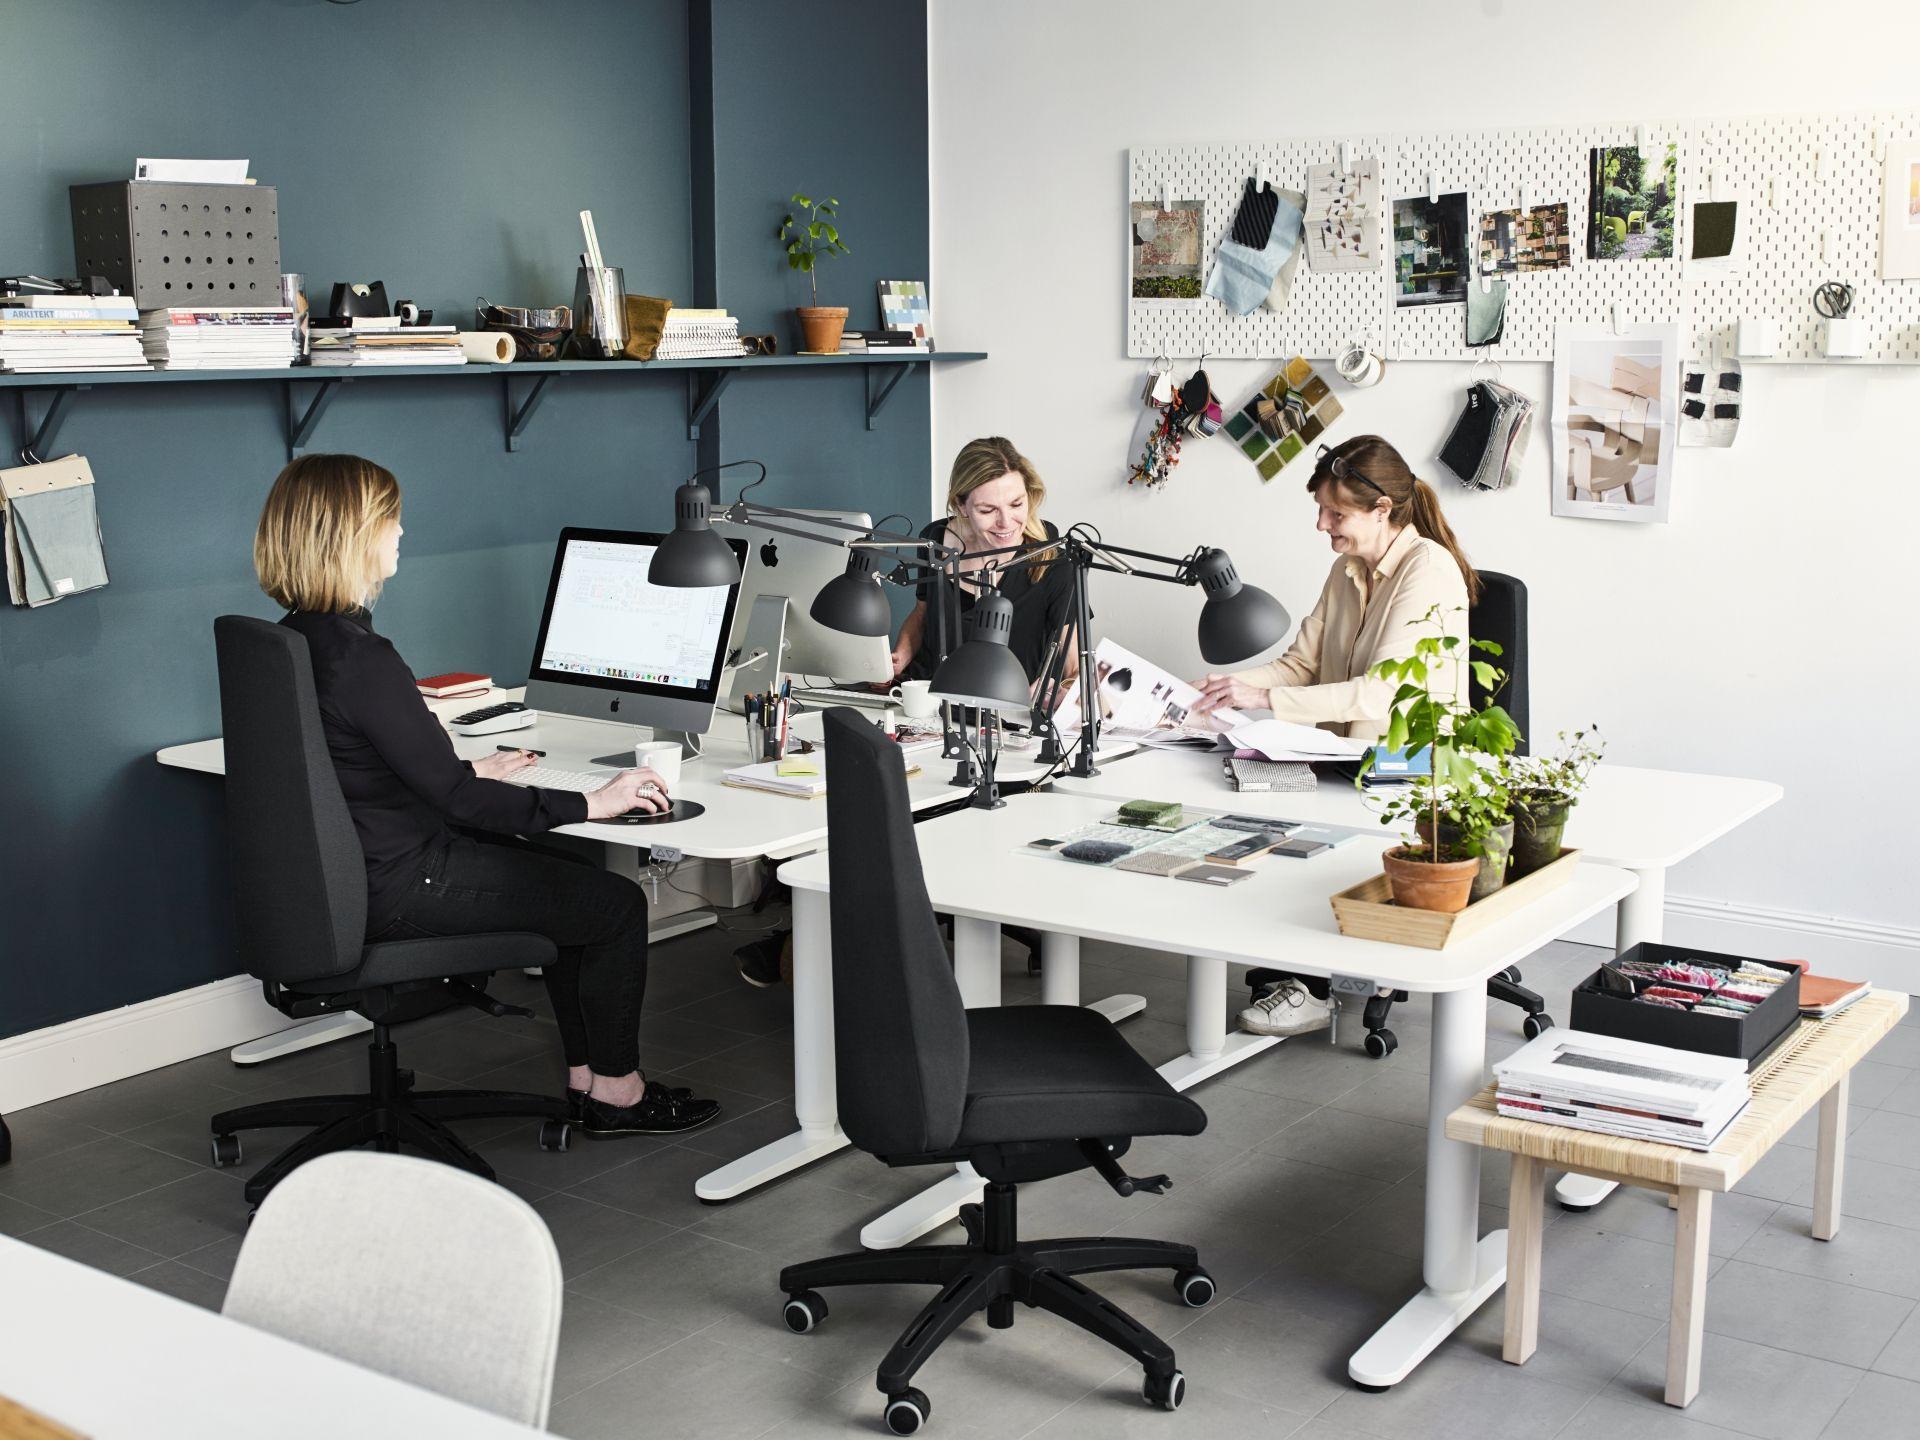 Bureau Tafel Ikea Wit.Bekant Bureau Wit Ikea Ikea Office Office Decor Ikea Bekant